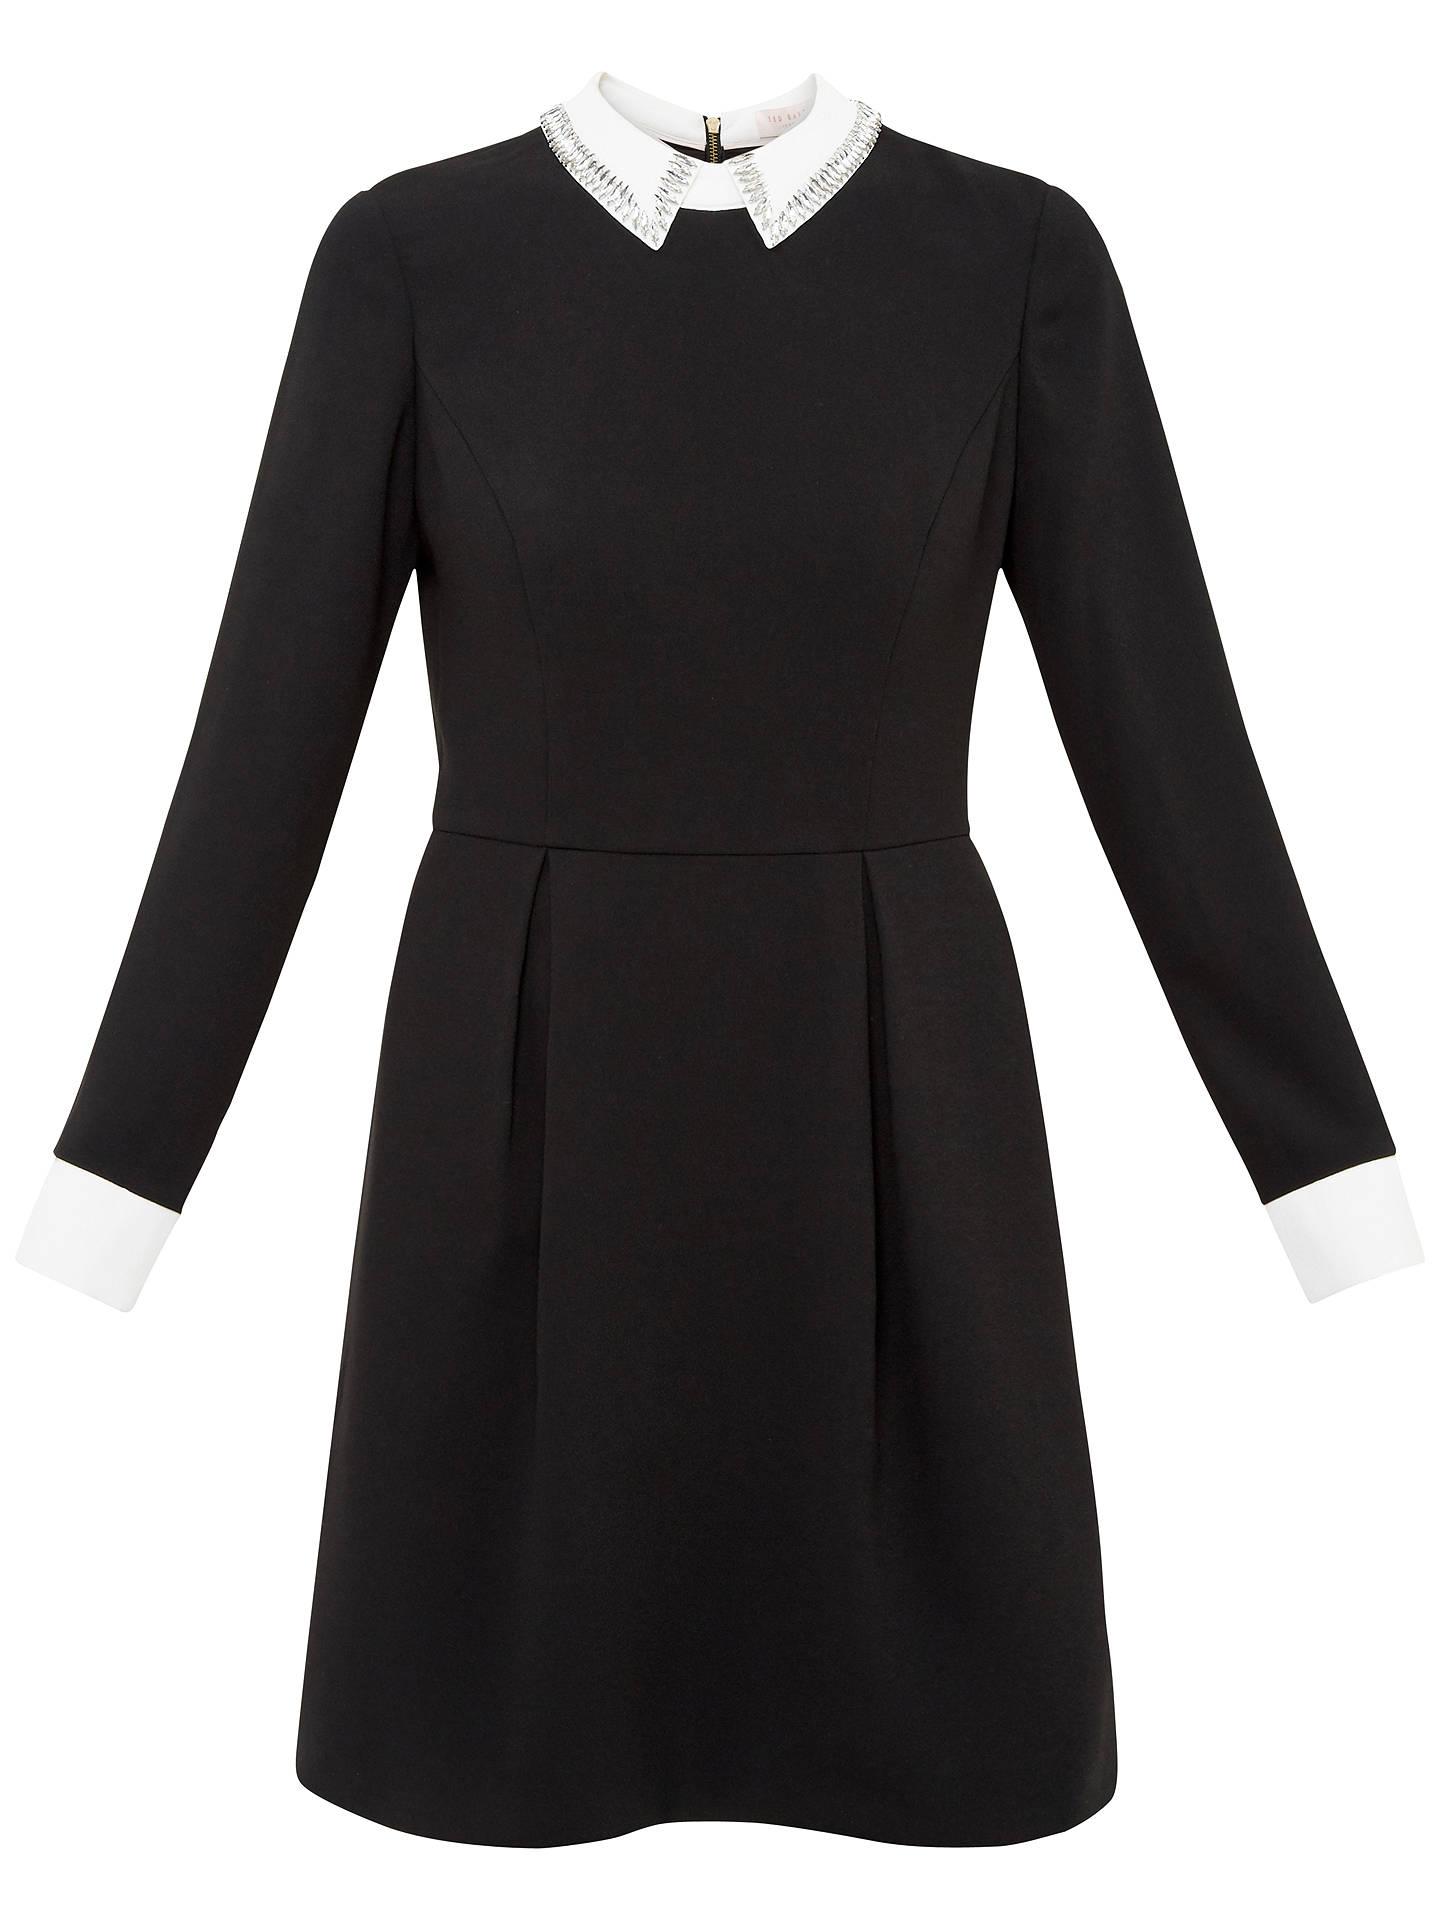 cf39fb256 Buy Ted Baker Timu Embellished Collared Dress